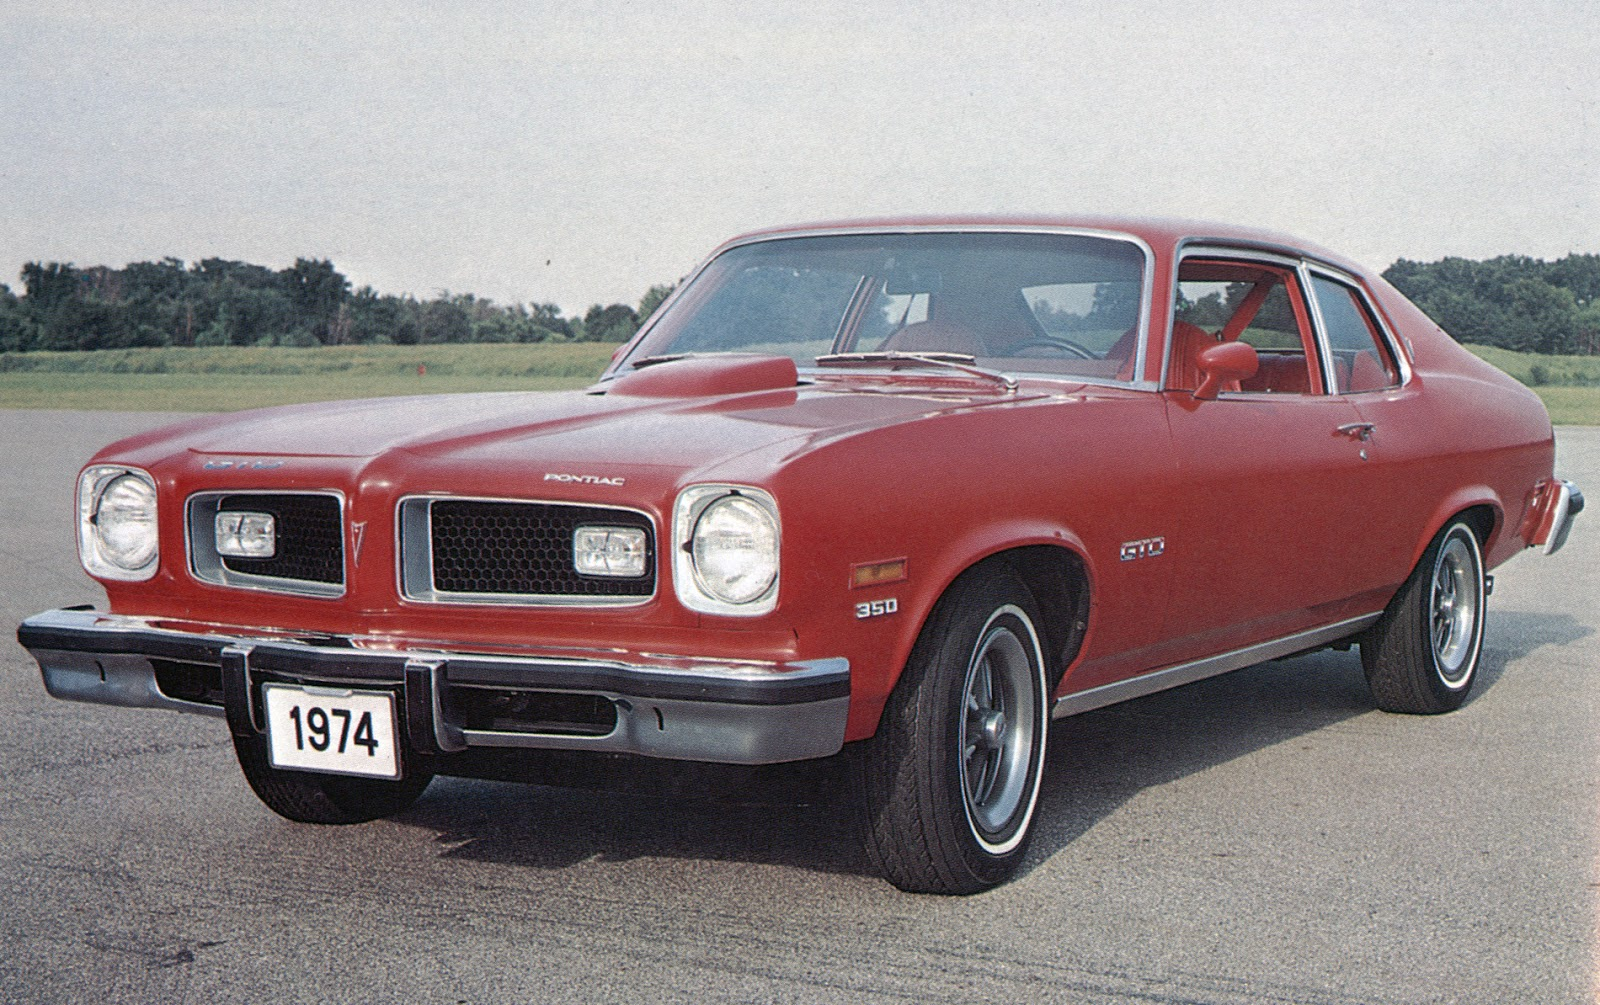 Pontiac GTO III 1974 - 1974 Liftback #7